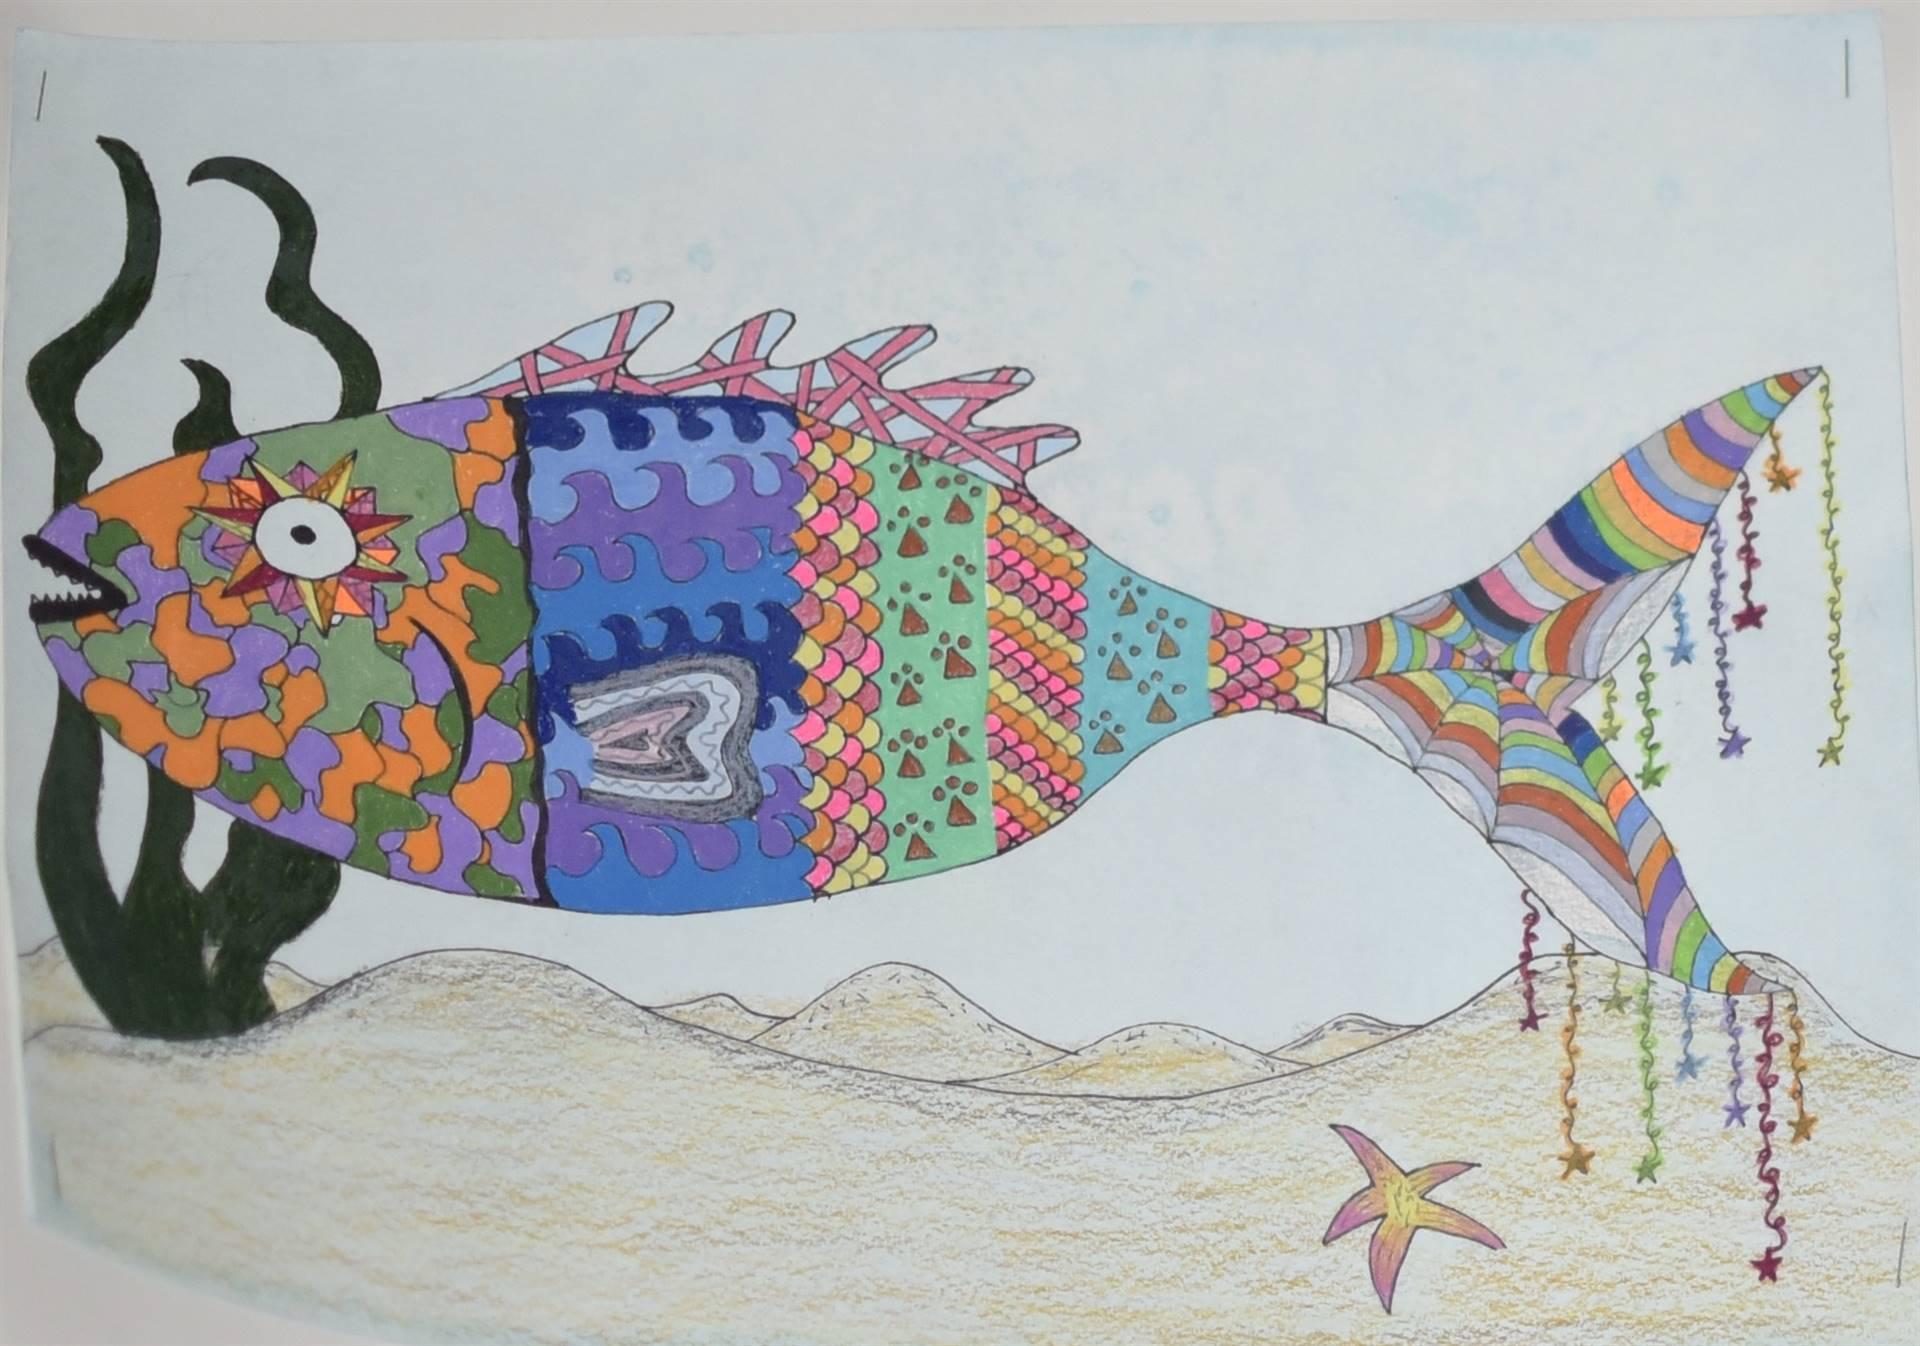 Brecksville-Broadview Hts. Middle School Art Projects 137